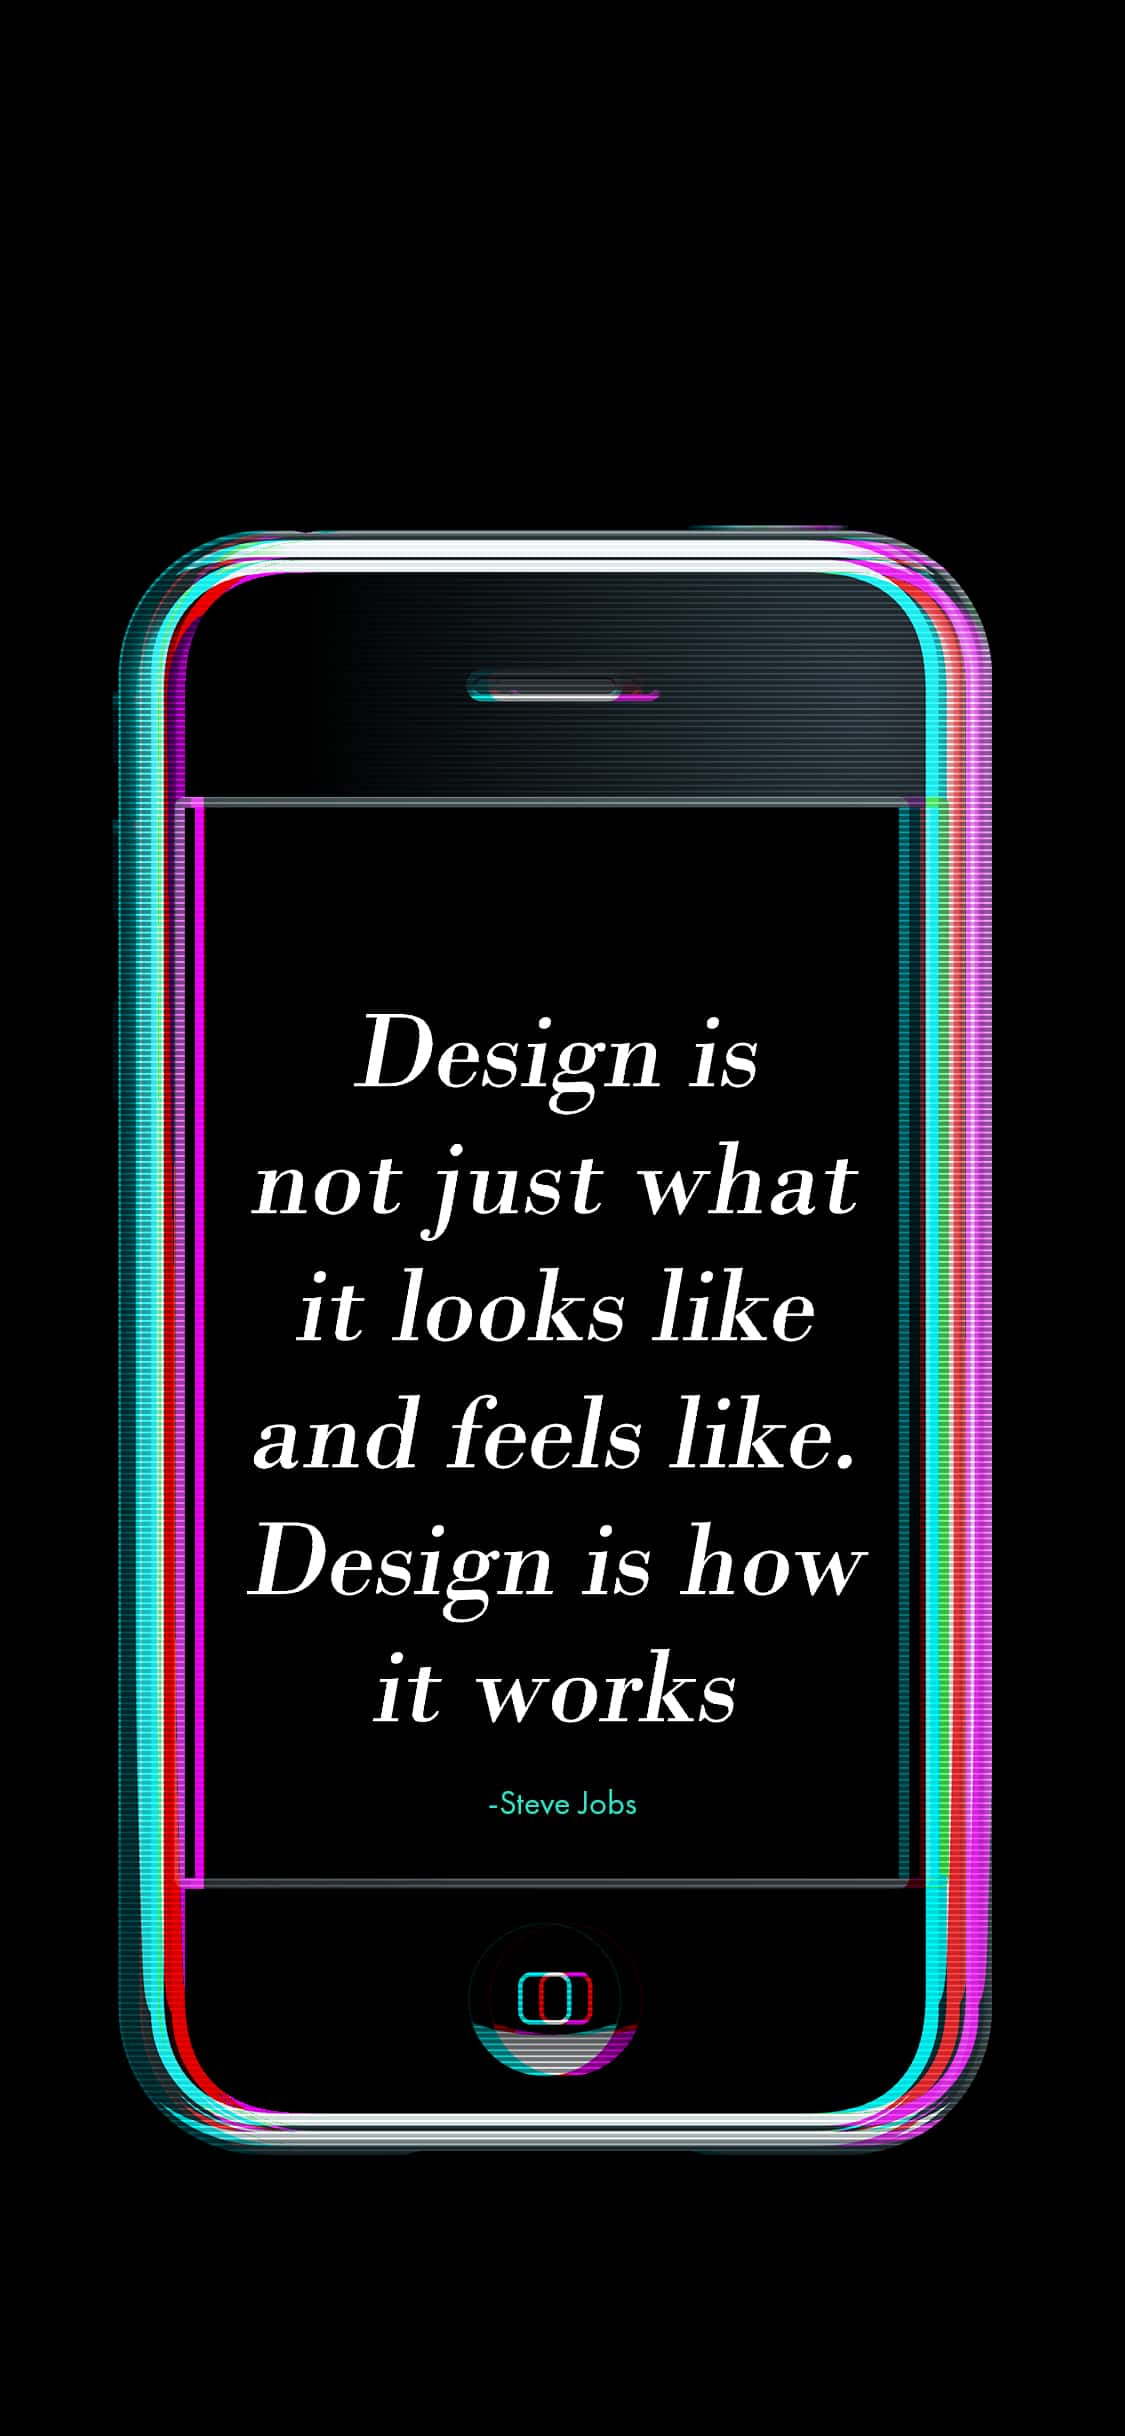 Steve Jobs Inspiring quote 8